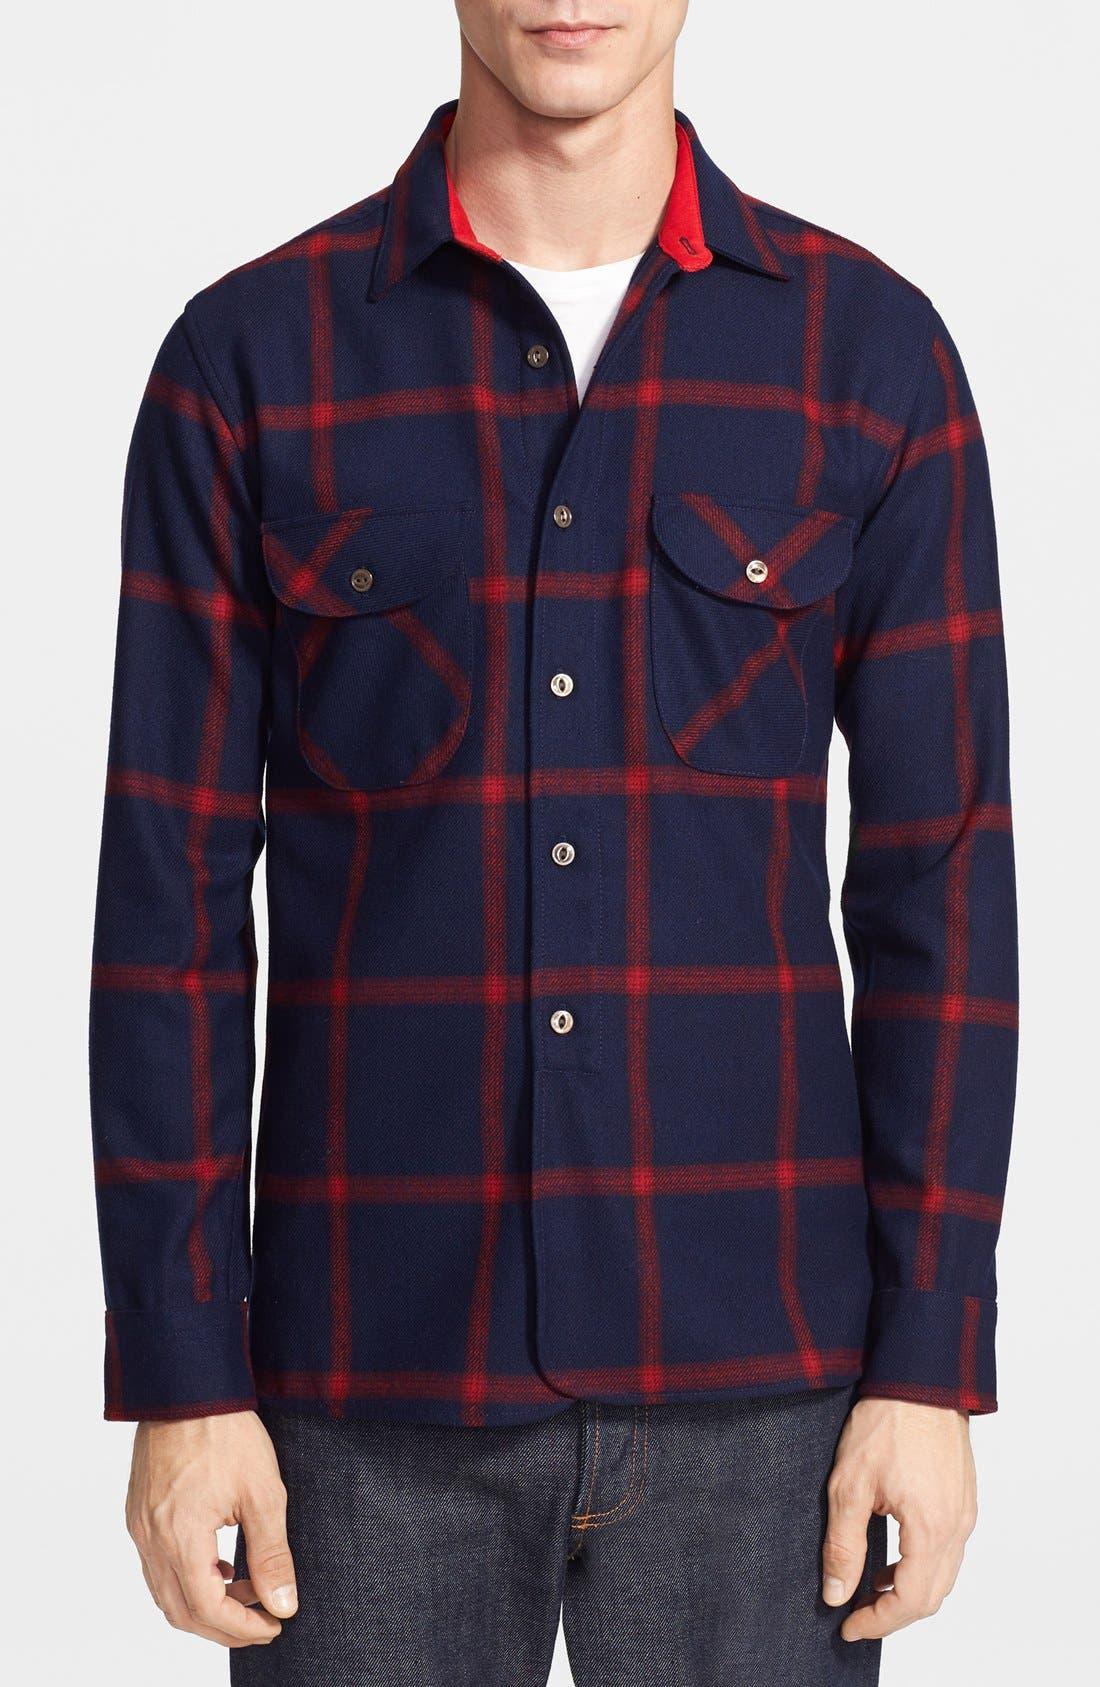 Main Image - Pendleton Thomas Kay Collection 'Oliver' Check Wool Flannel Shirt